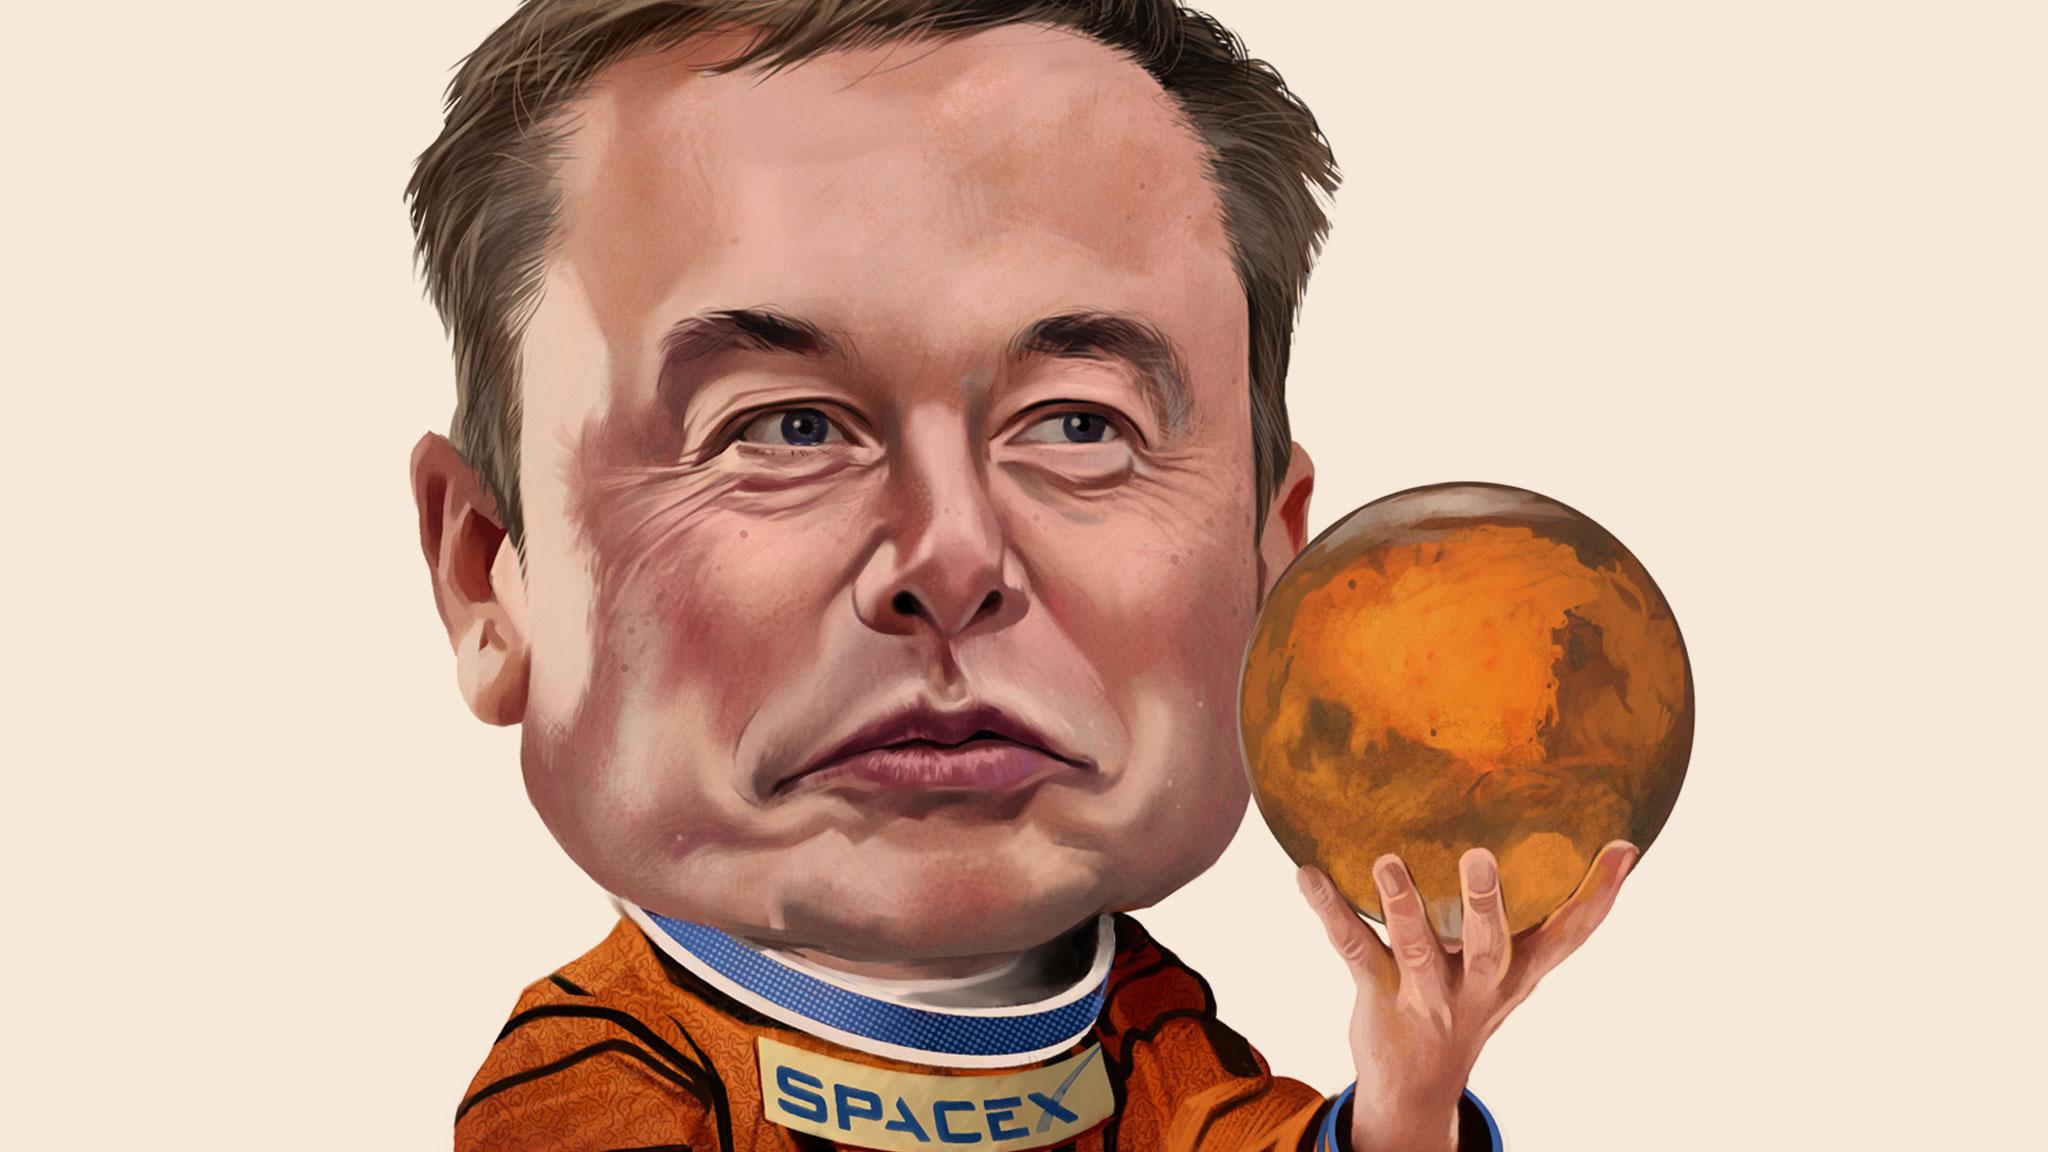 Elon Musk Billionaire Tech Idealist And Space Entrepreneur Financial Times